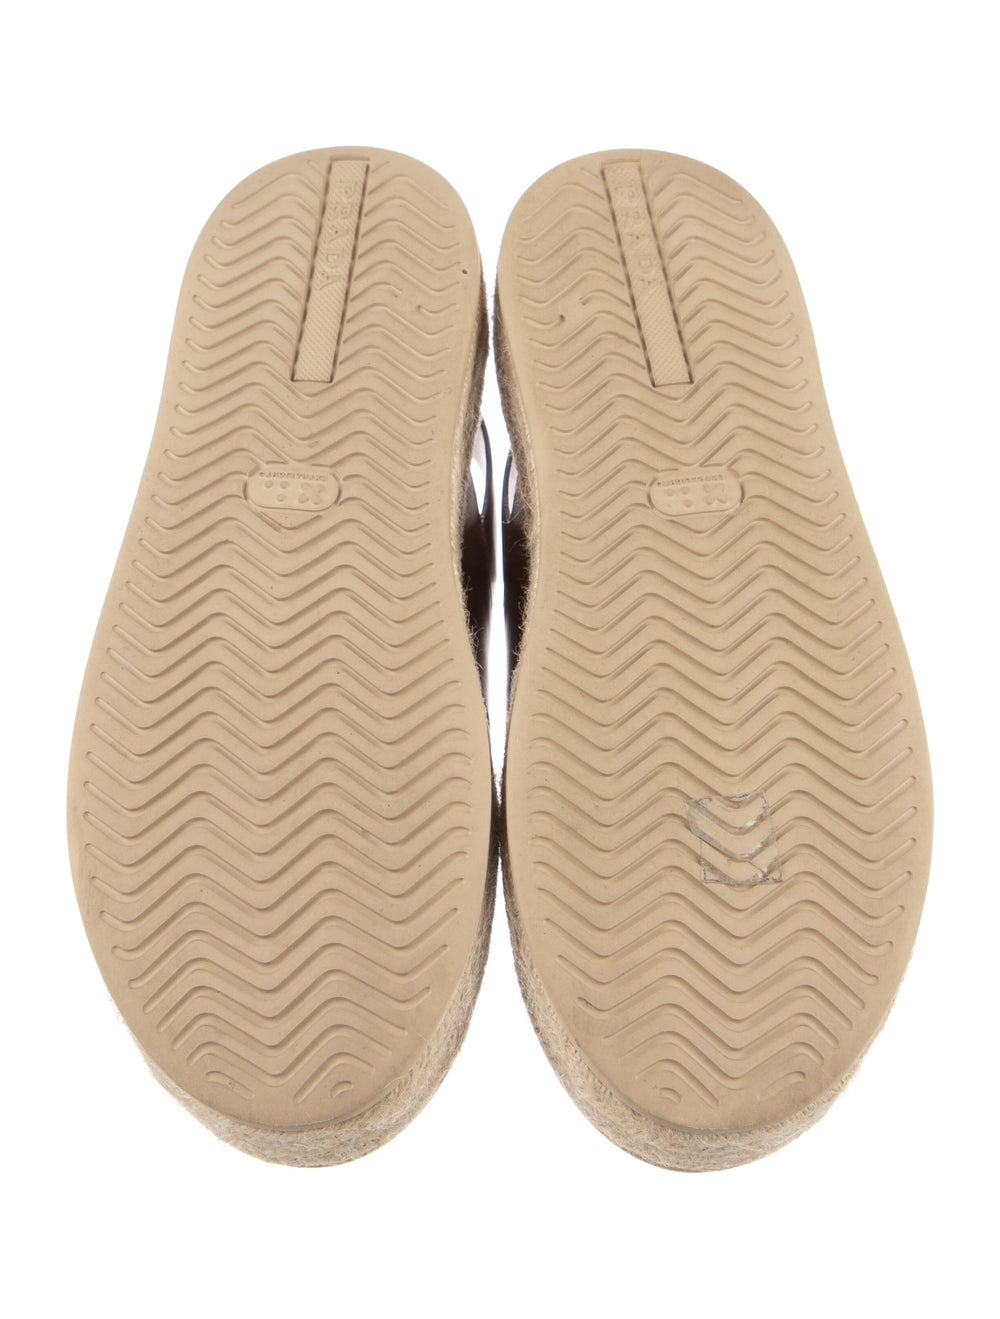 Prada Leather Espadrilles Brown - image 5